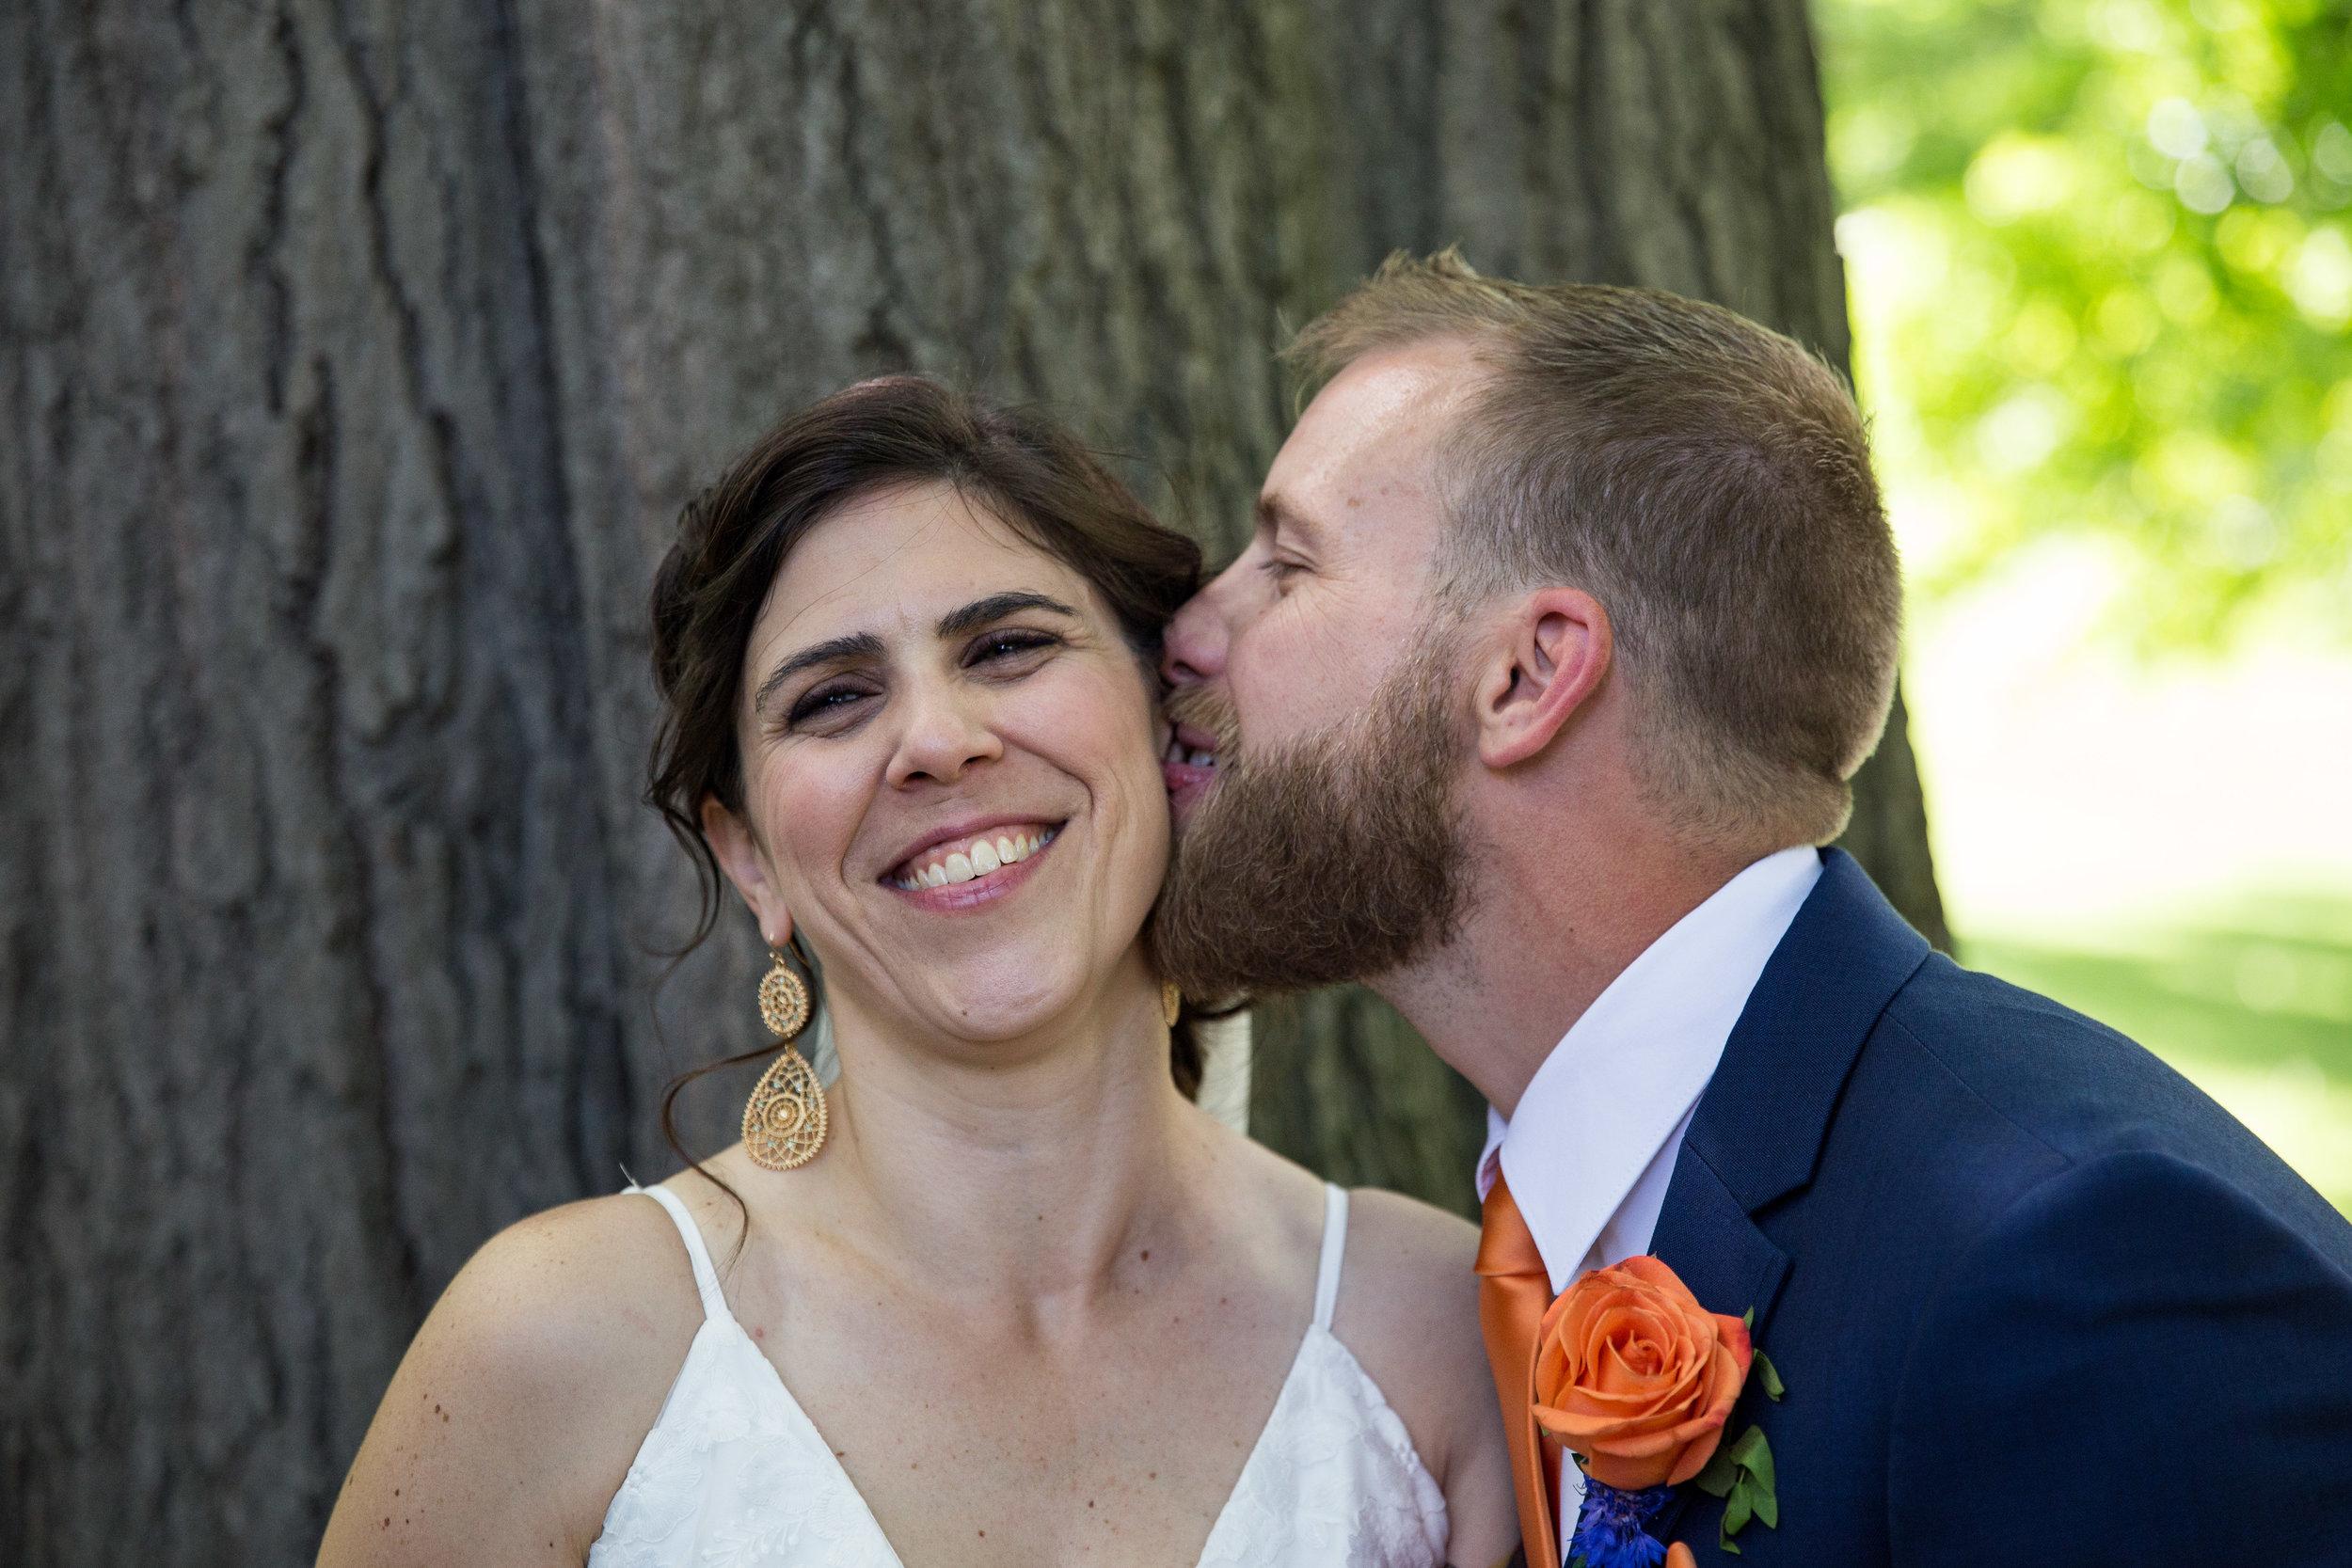 Natalie and Dallas Mooney Wedding 6-8-19_Tania Watt Photography-390.jpg